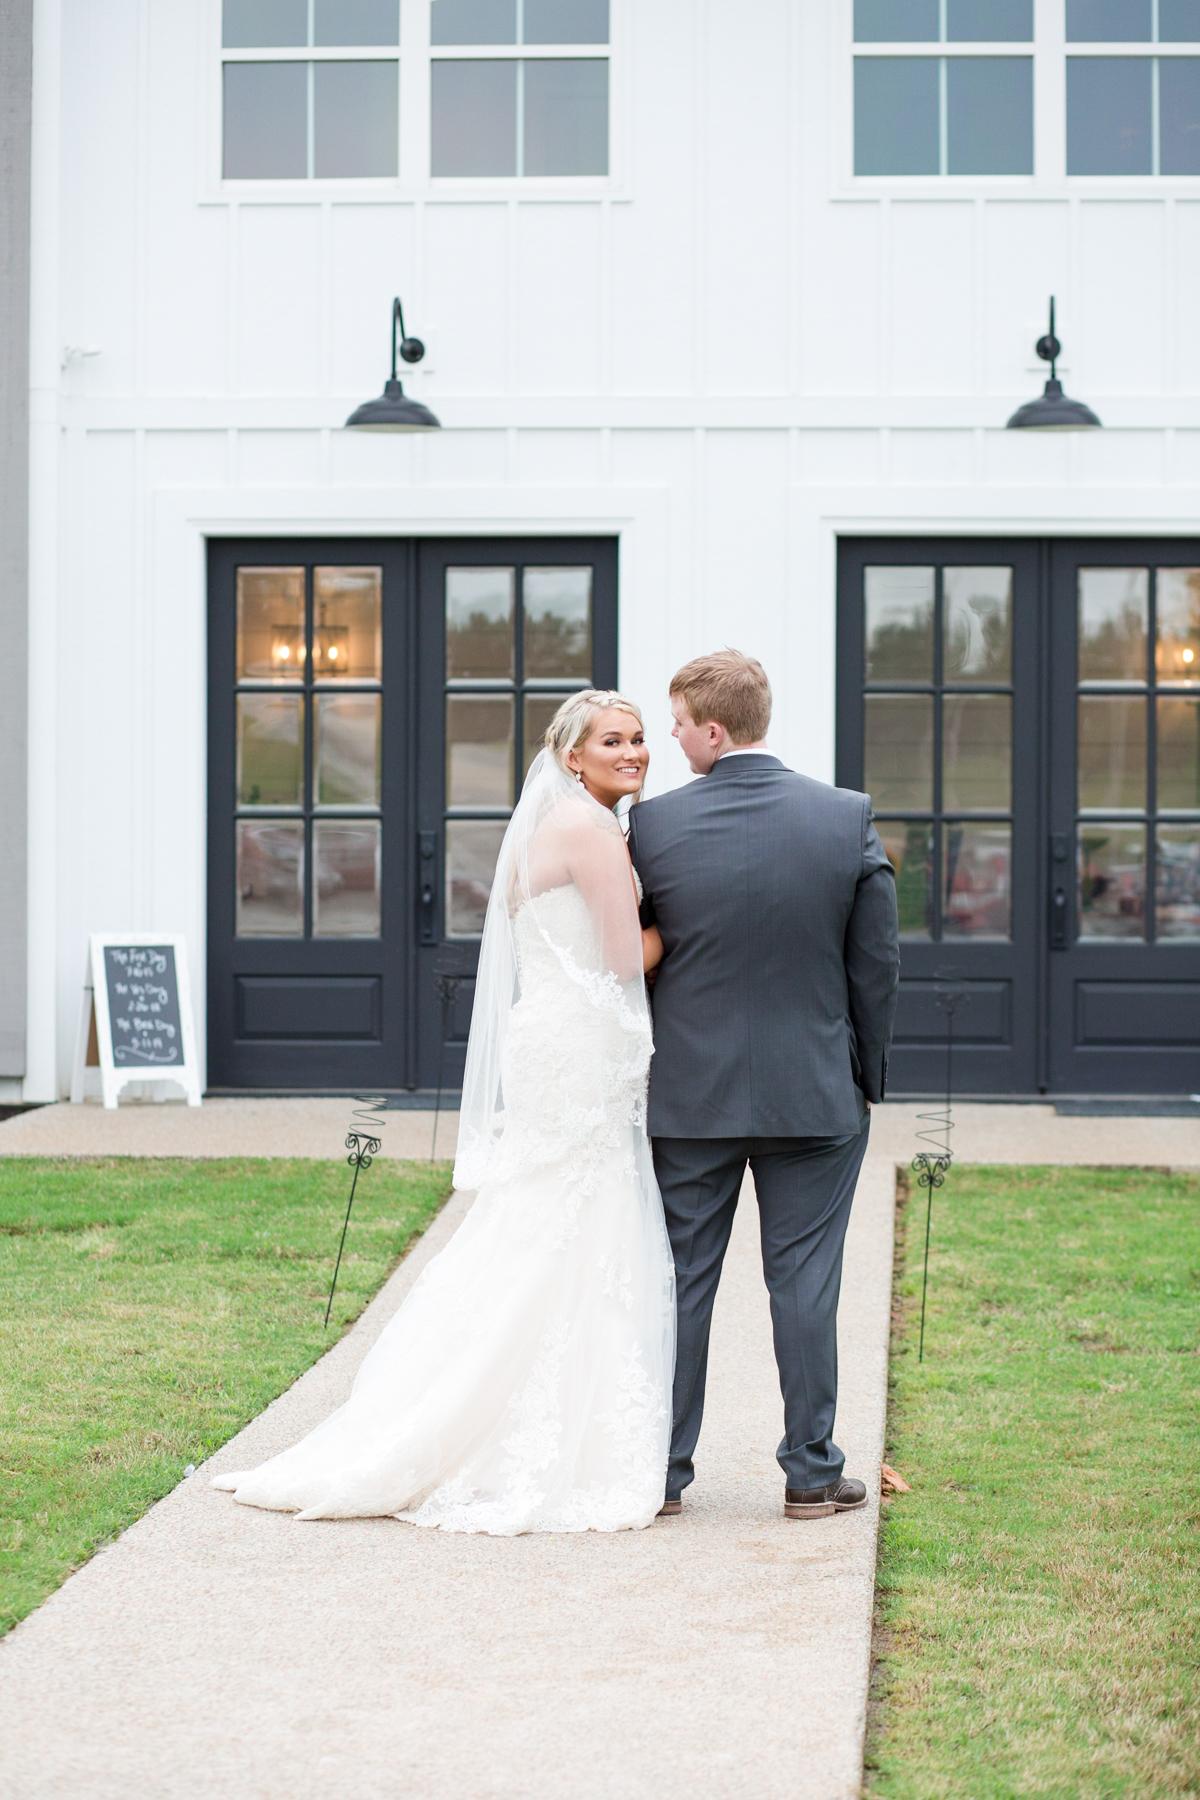 The-venue-at-white-oak-farms-wedding-nashville-wedding-photographers-0271.jpg